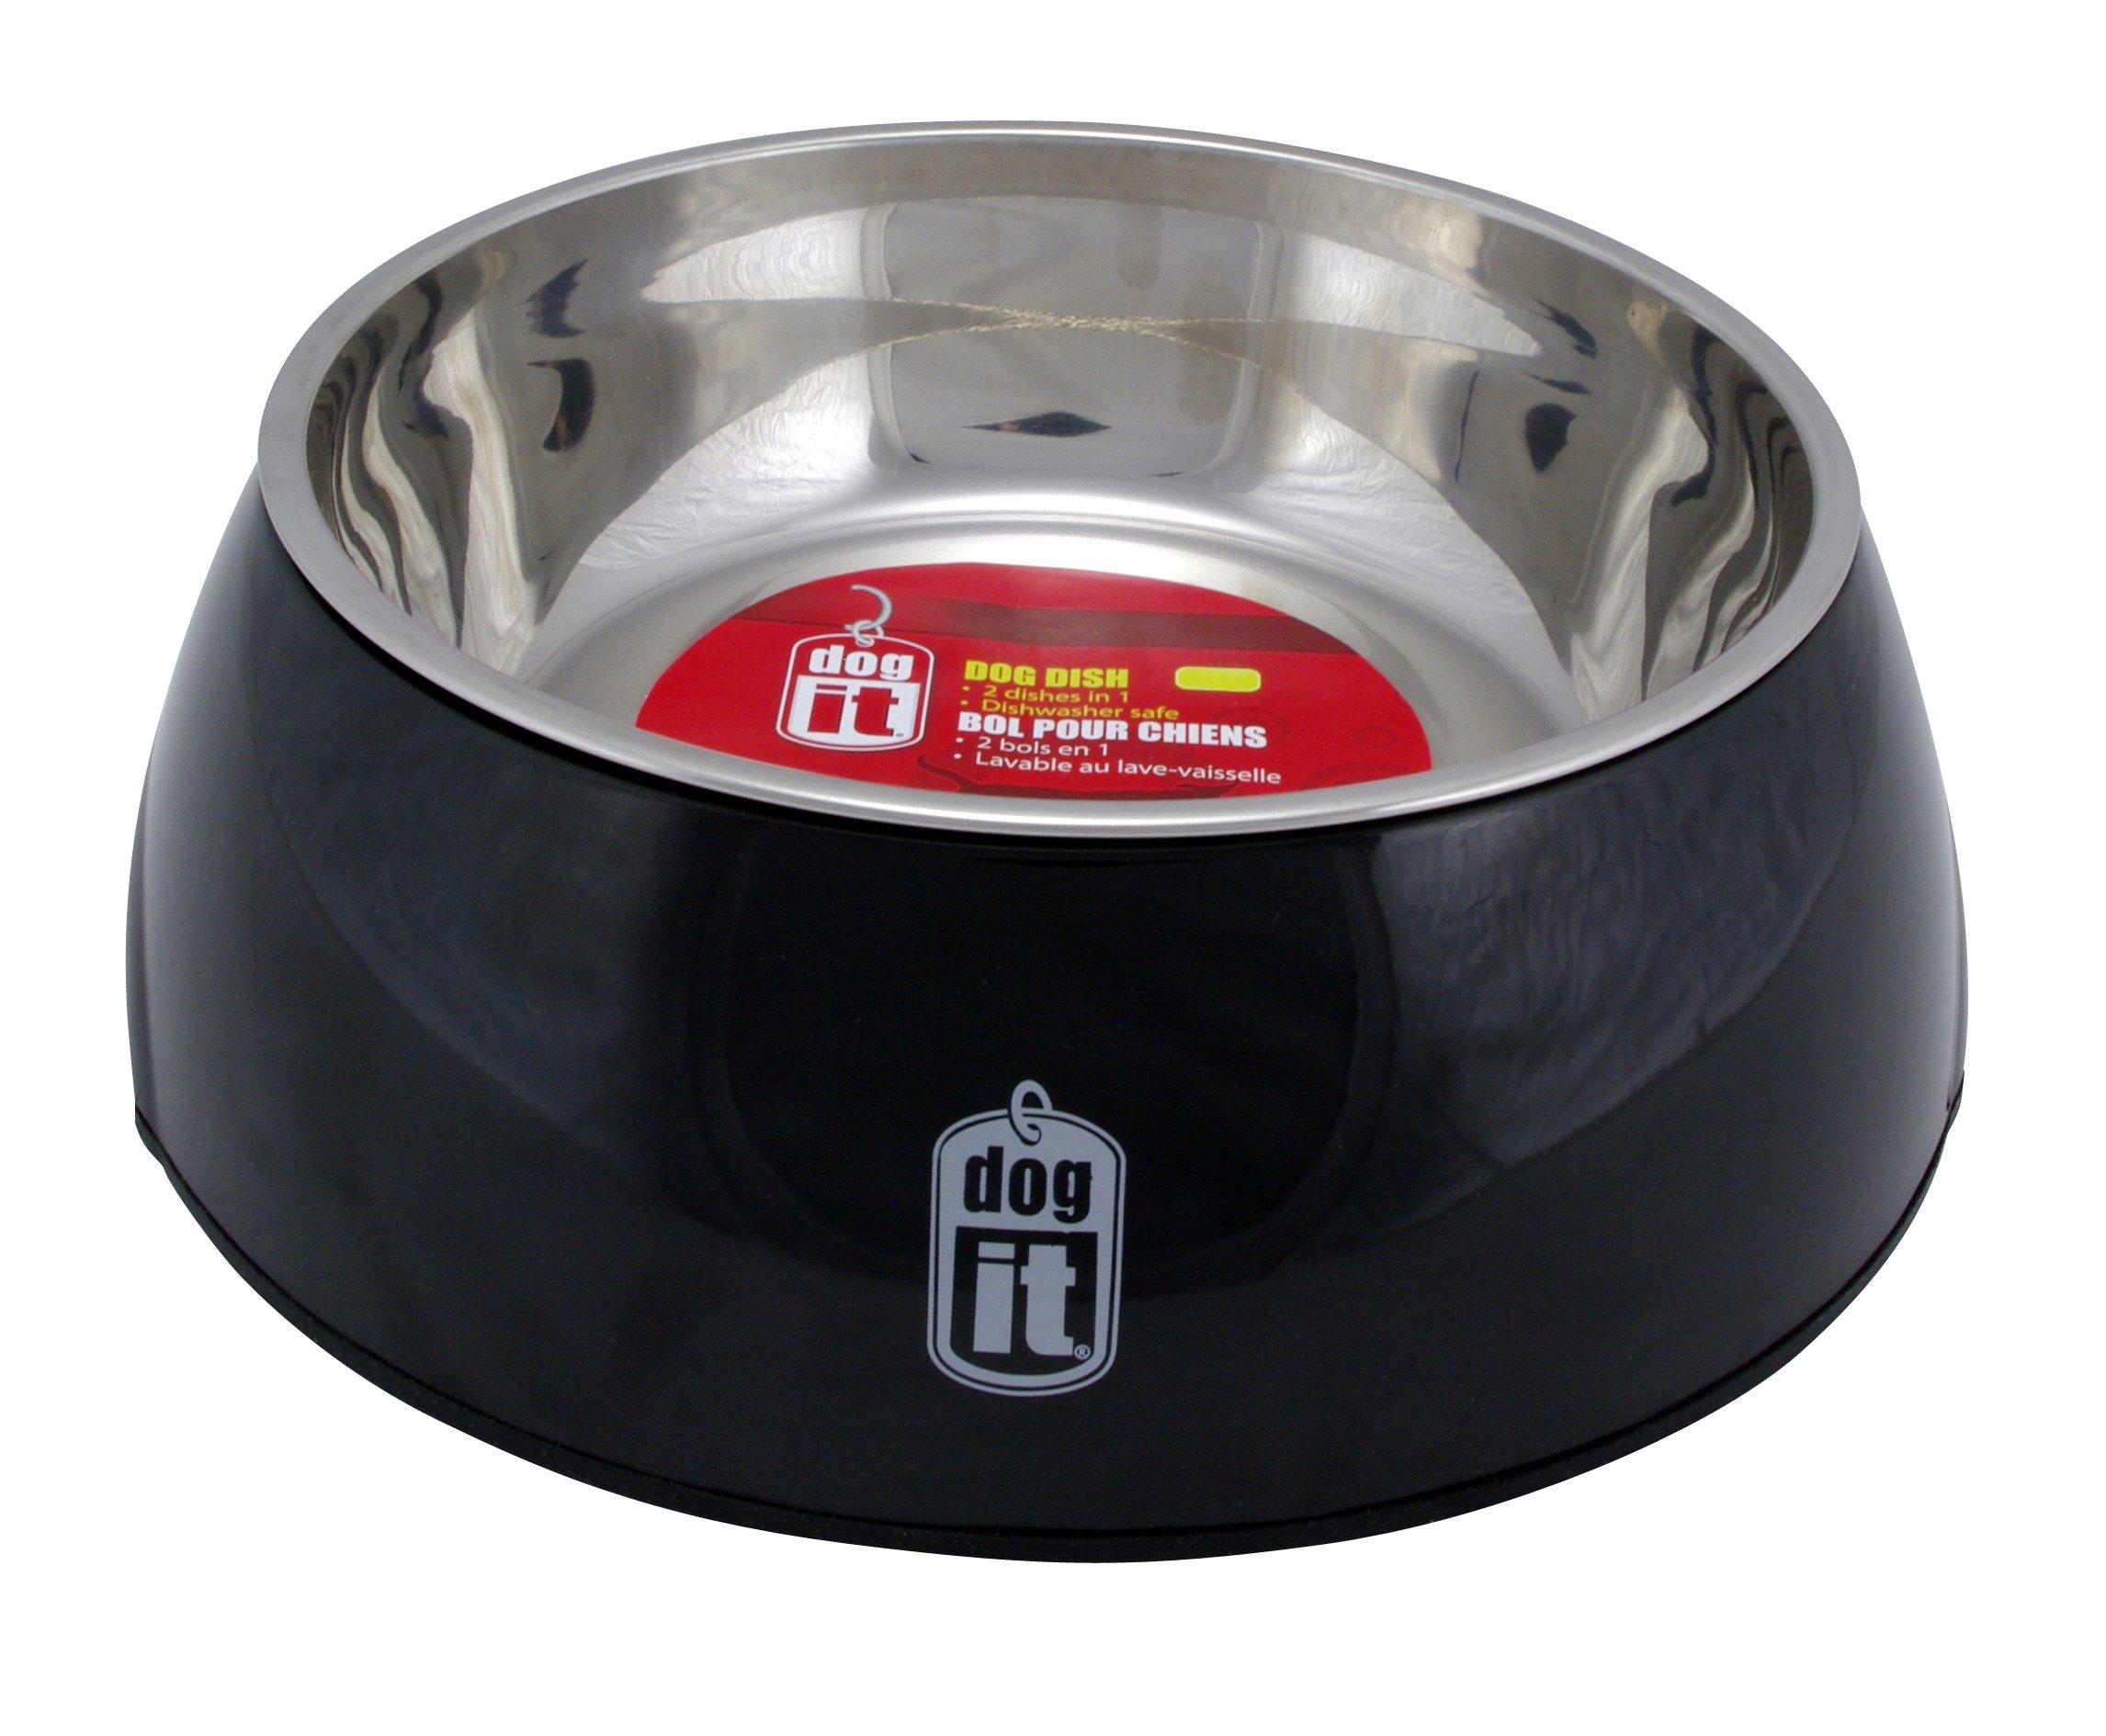 Dogit 2-in-1 Durable Bowl, Black, Medium